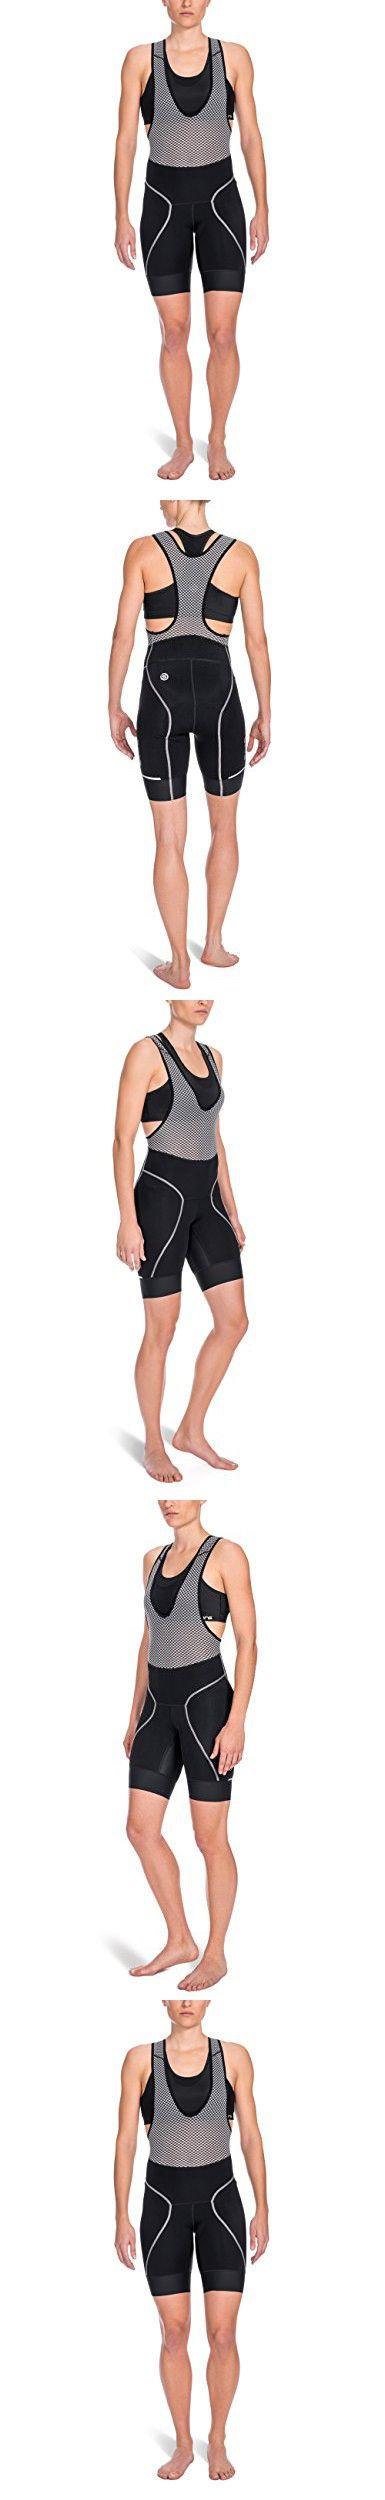 SKINS Women's Cycle Bib Shorts, Black, Small